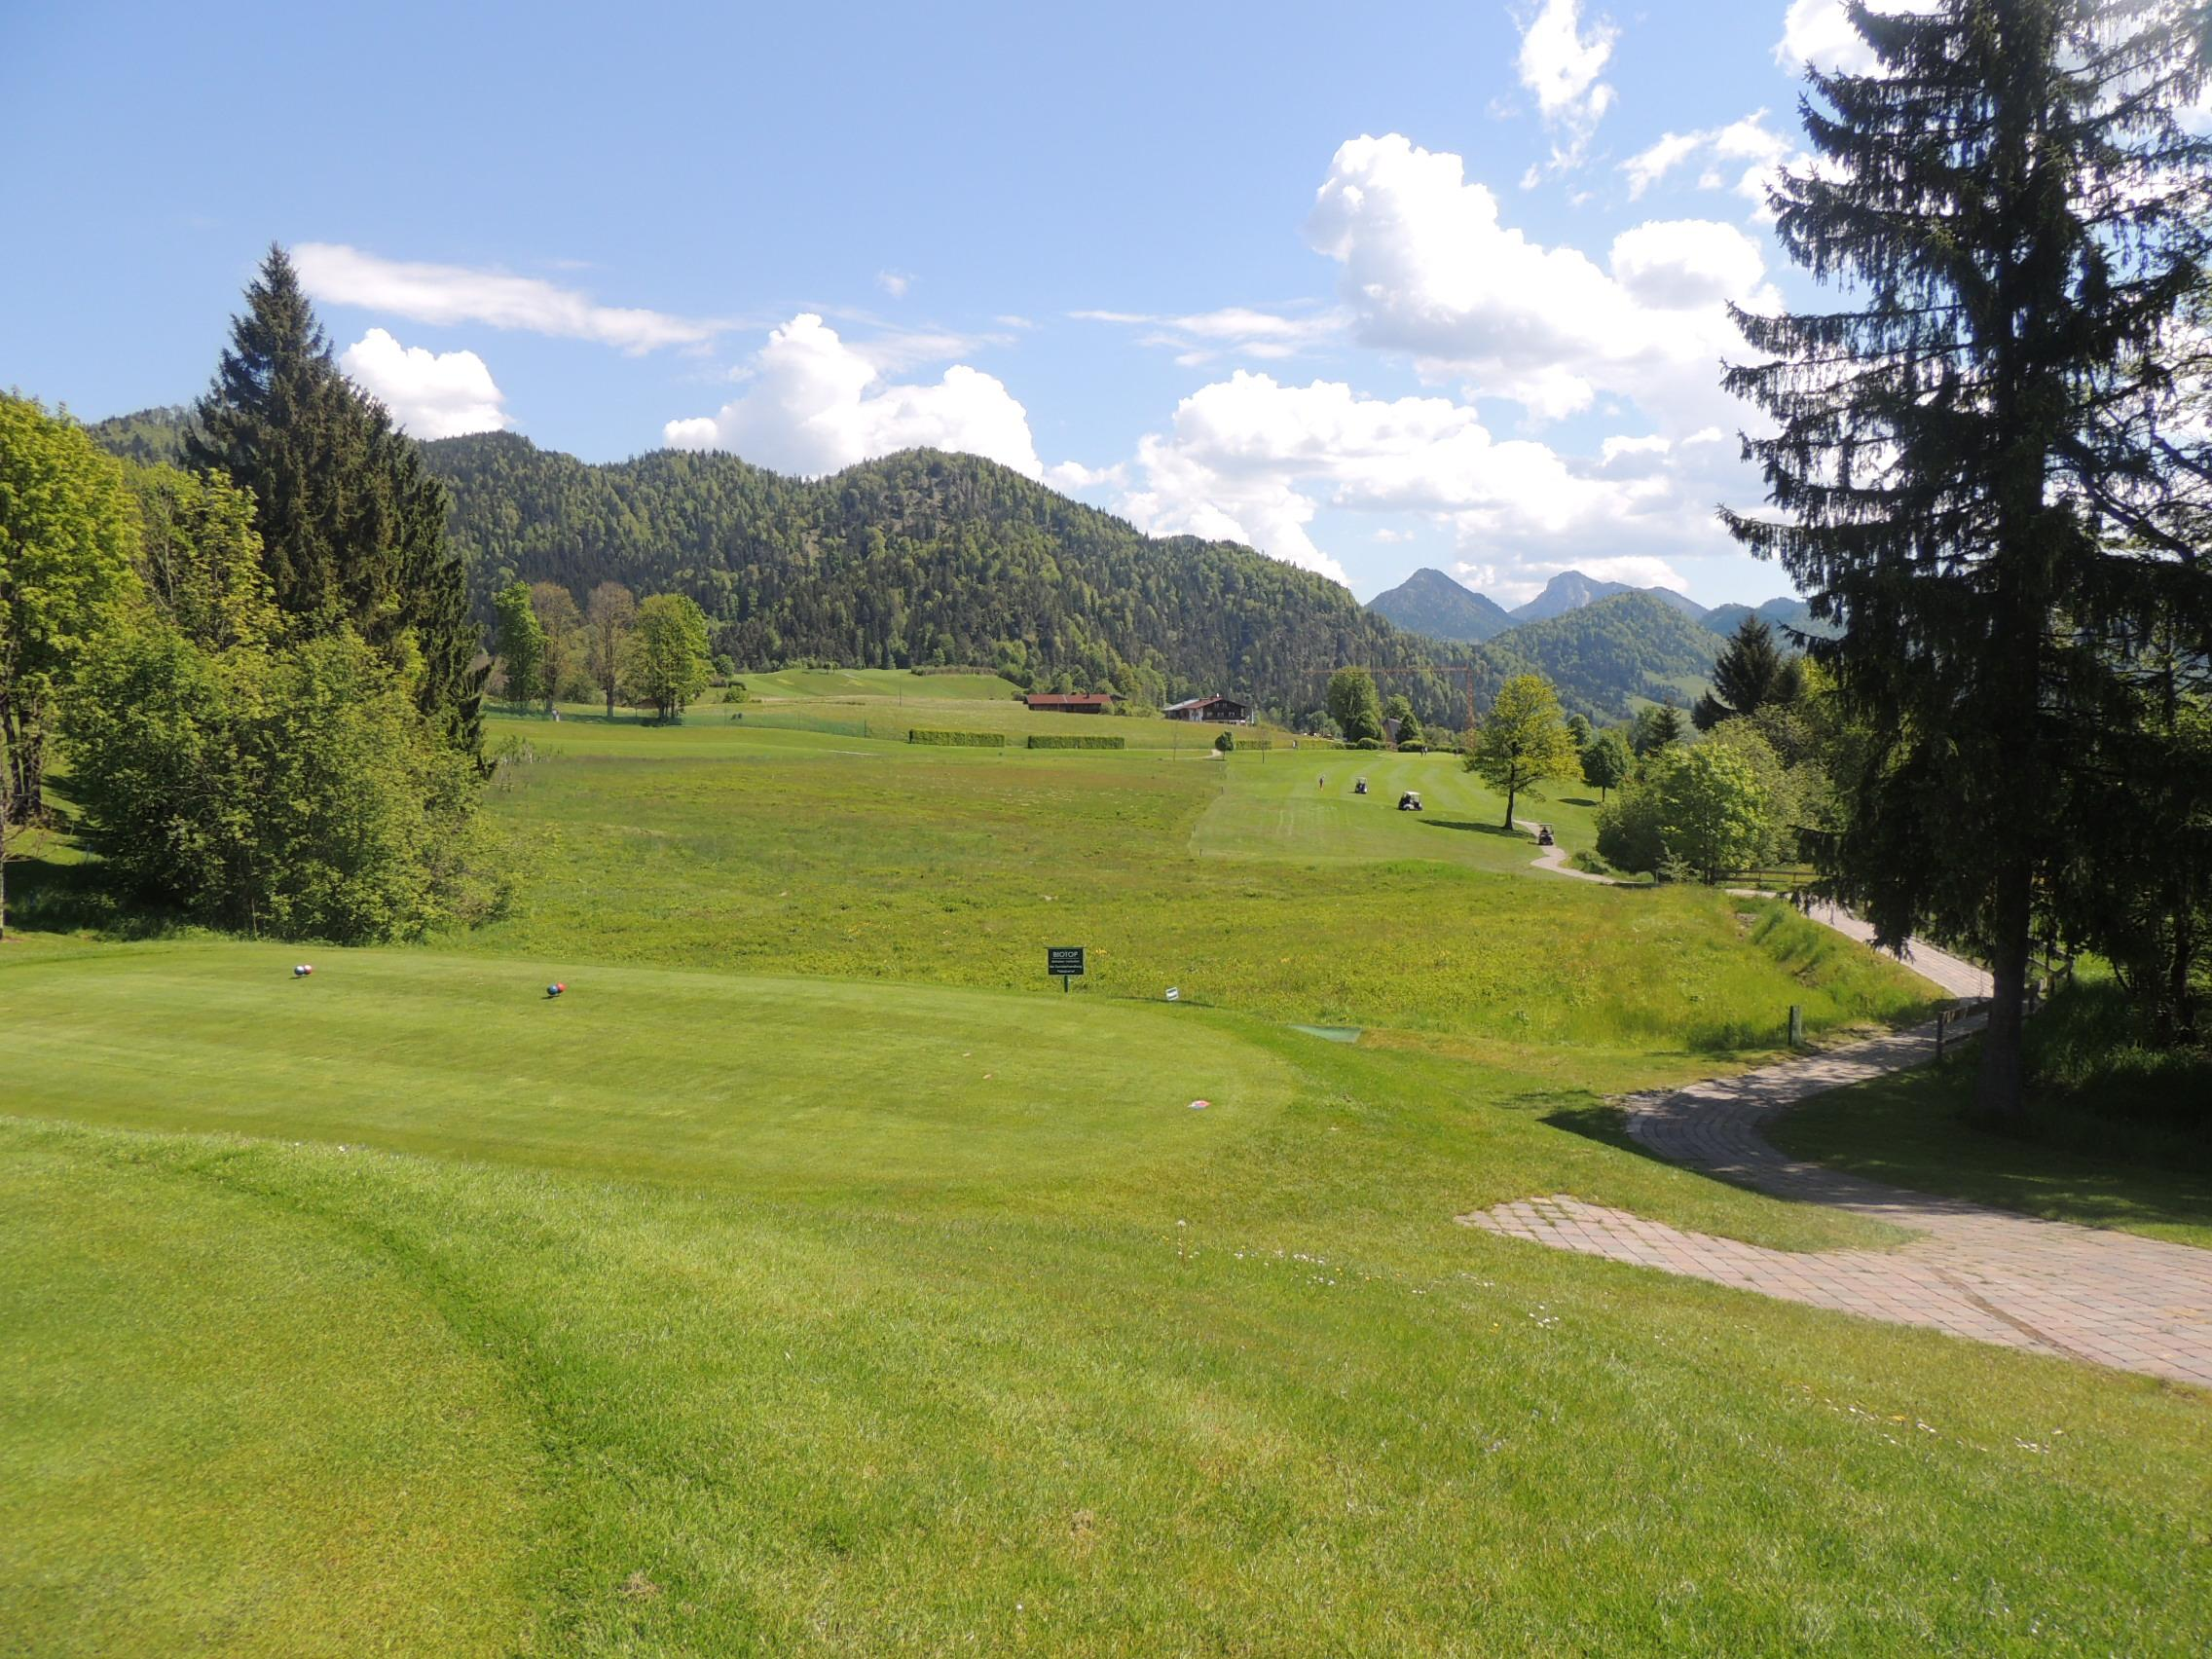 Golfplatz Reit im Winkl